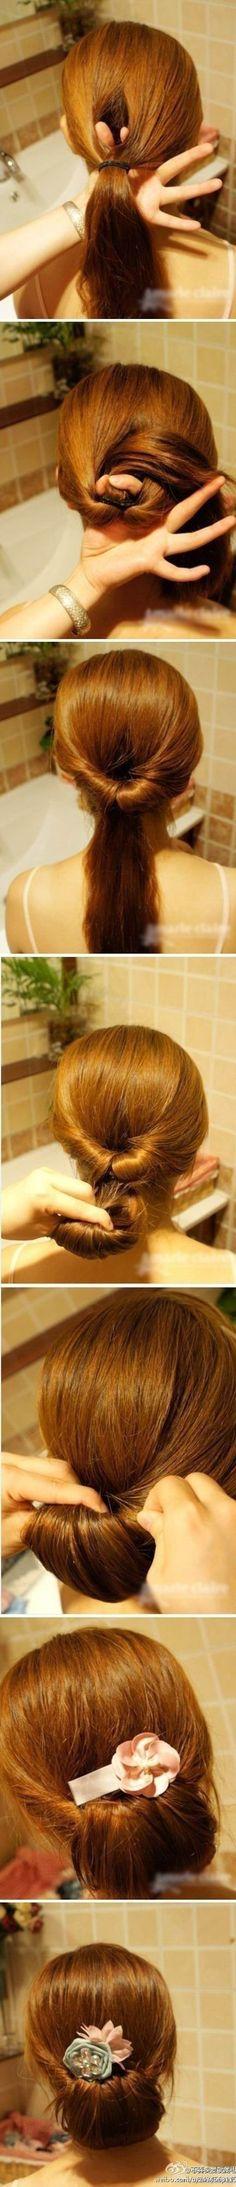 Hair Tutorials: 20 Ways To Style Your Hair In Summer Season | Pinkula